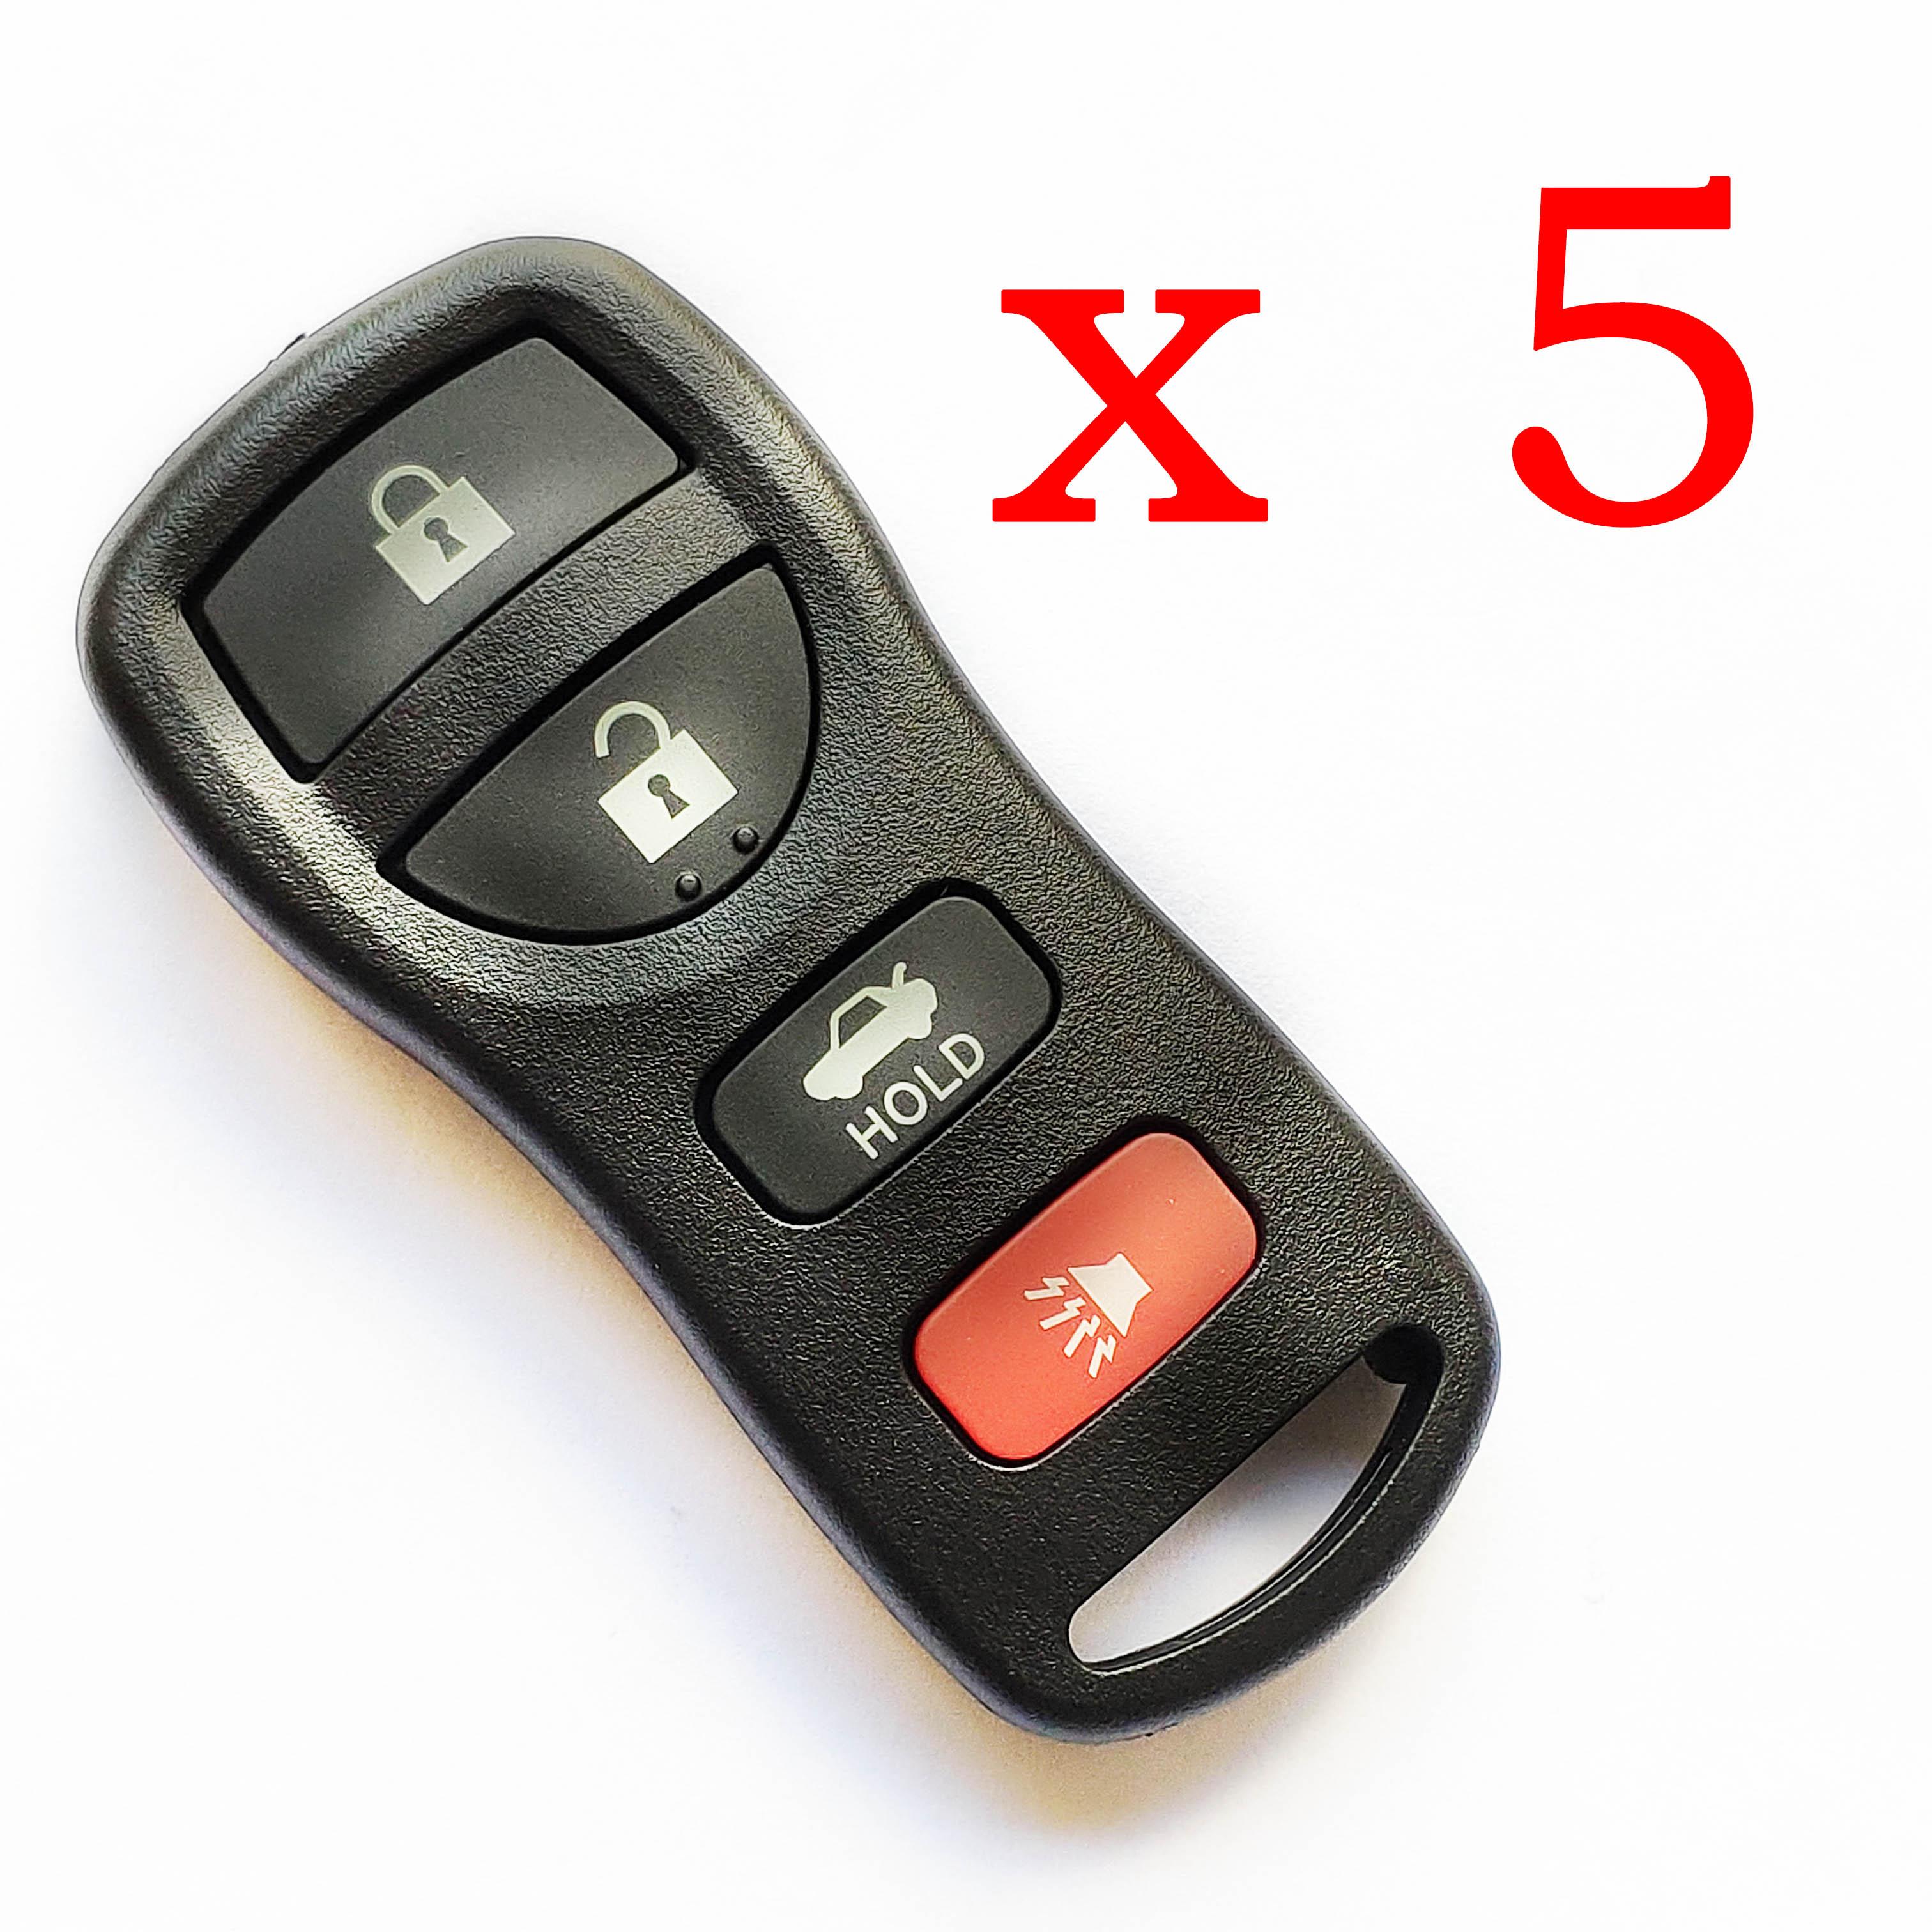 5 pieces Nissan Type Universal Remote Control for Xhorse VVDI - XKNI00EN